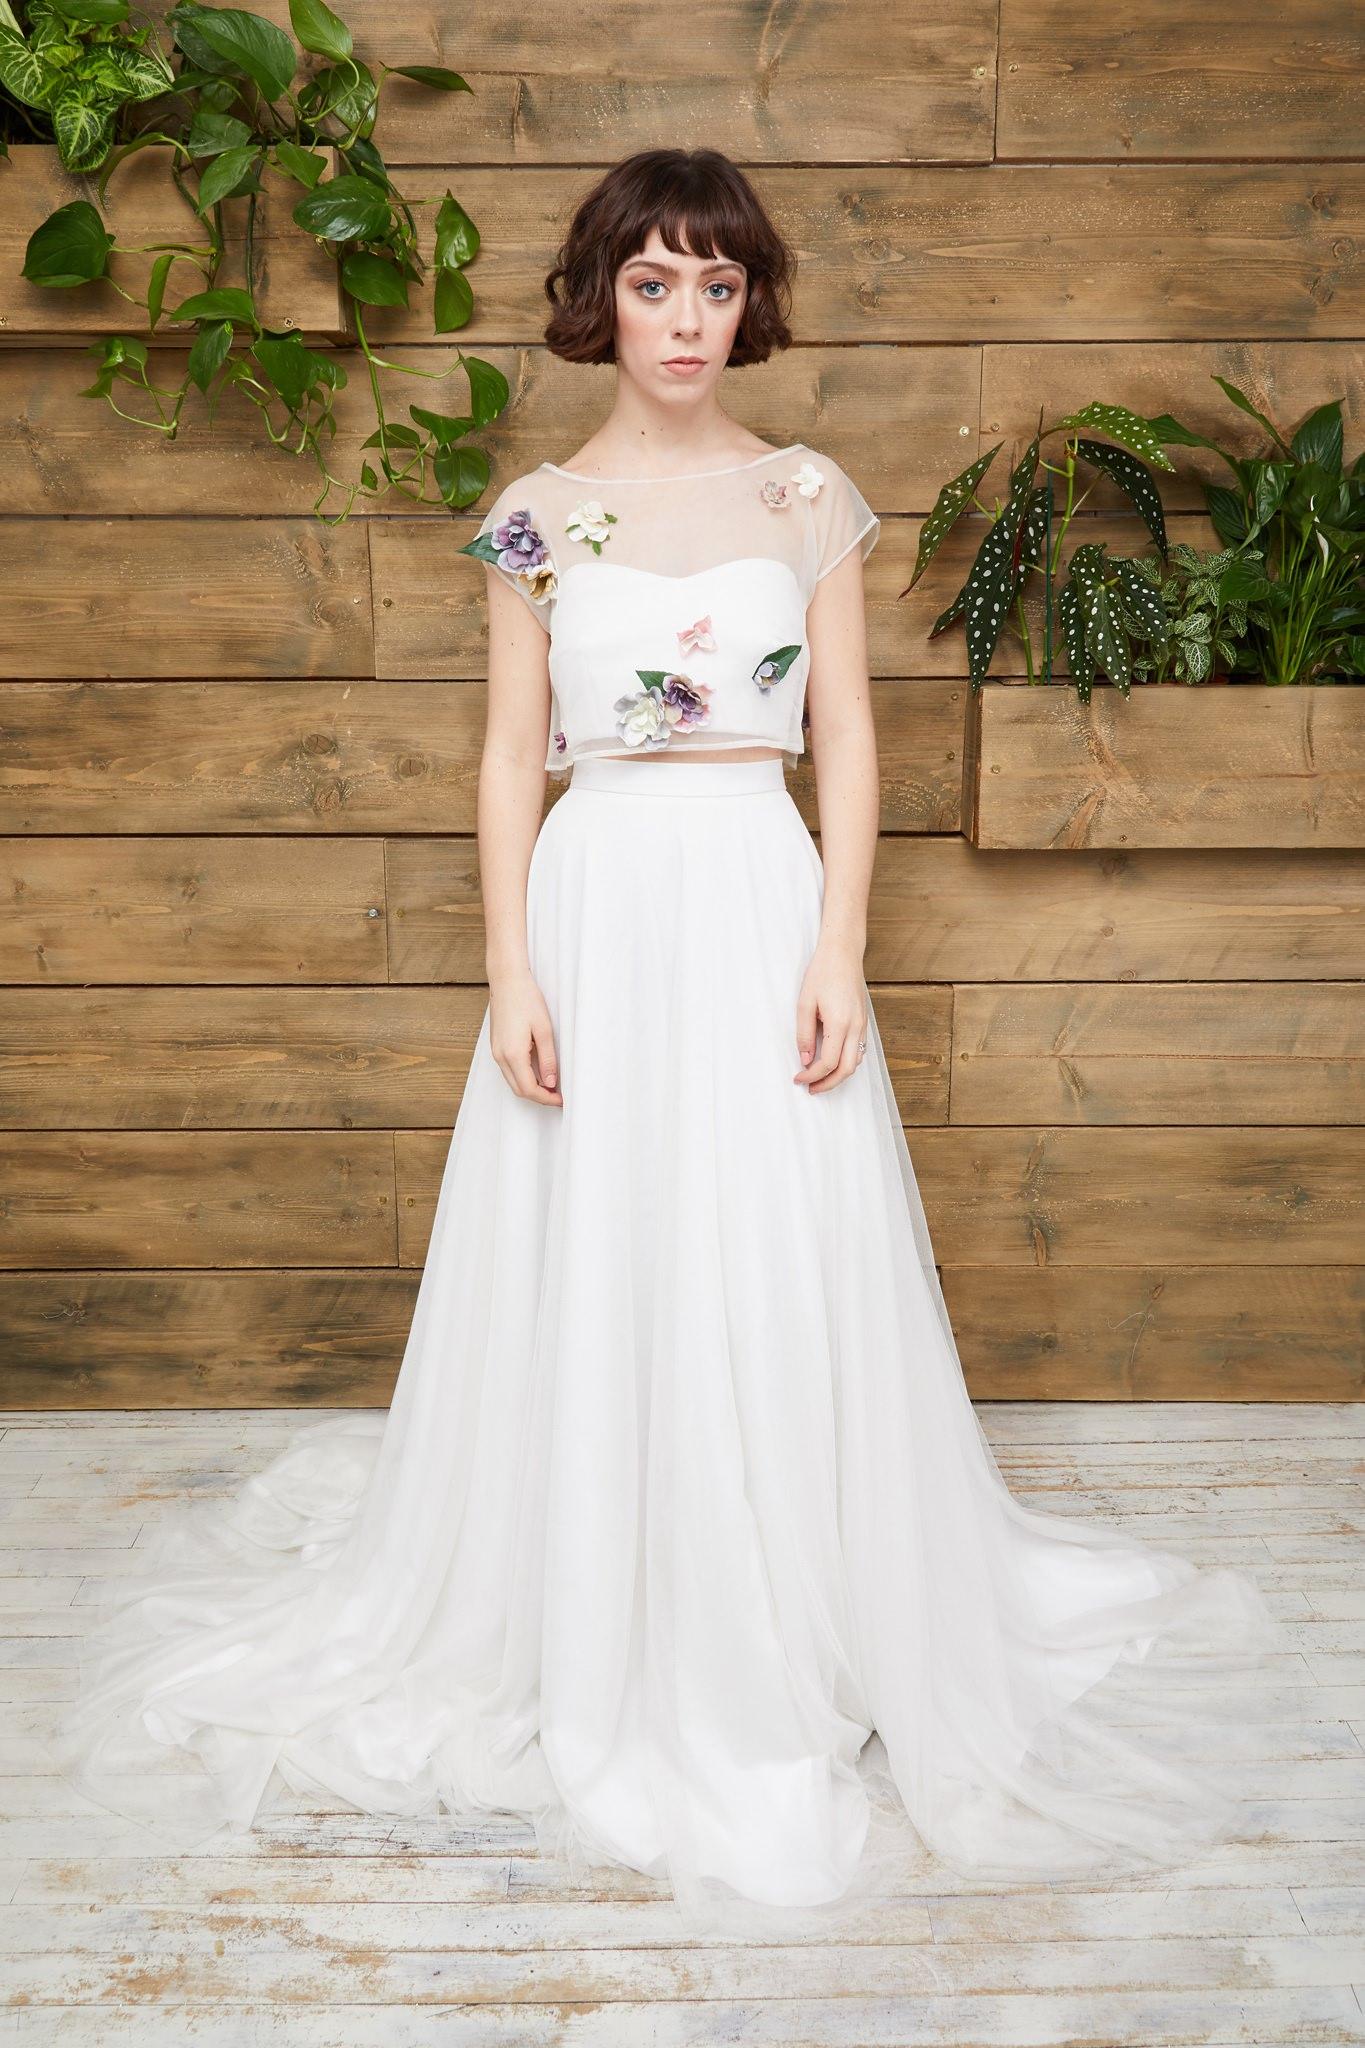 Rachel Burgess Bridal Boutique. Alternative Bridal, Boho Bride, Bridal Separates, Wedding Dress. E&W Couture.jpg